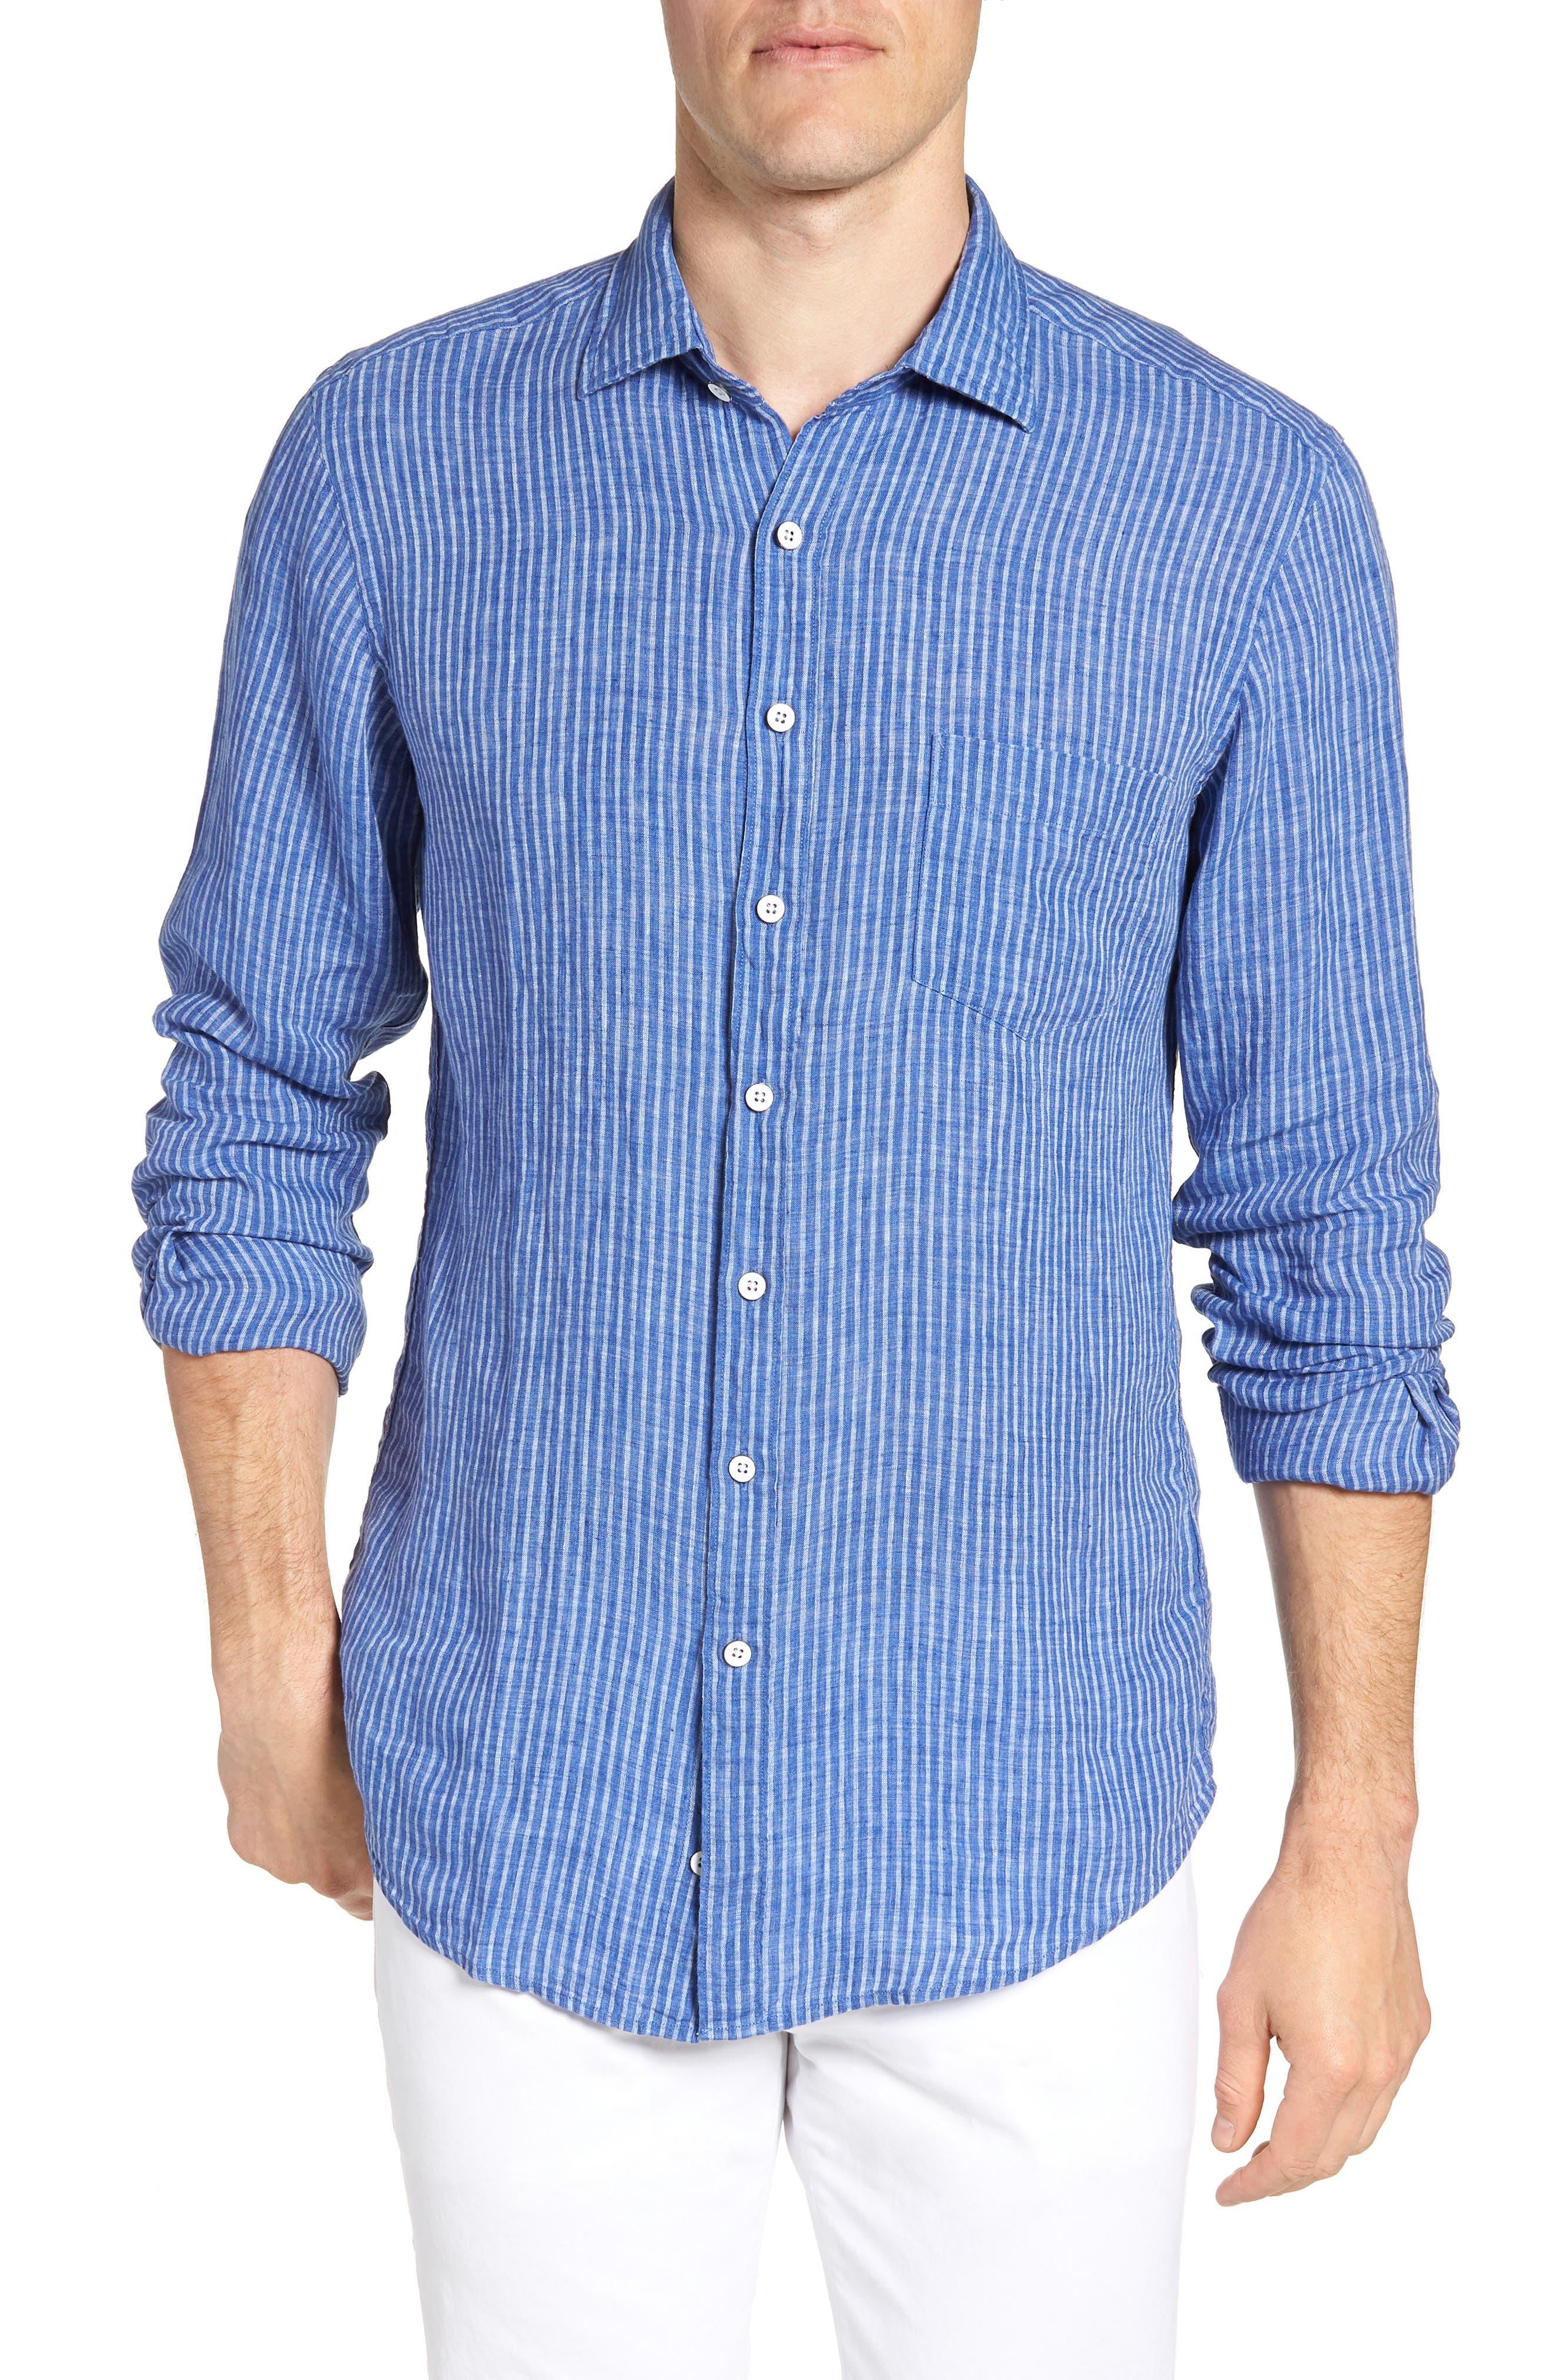 Warwick Junction Stripe Linen Sport Shirt,                         Main,                         color, ULTRAMARINE